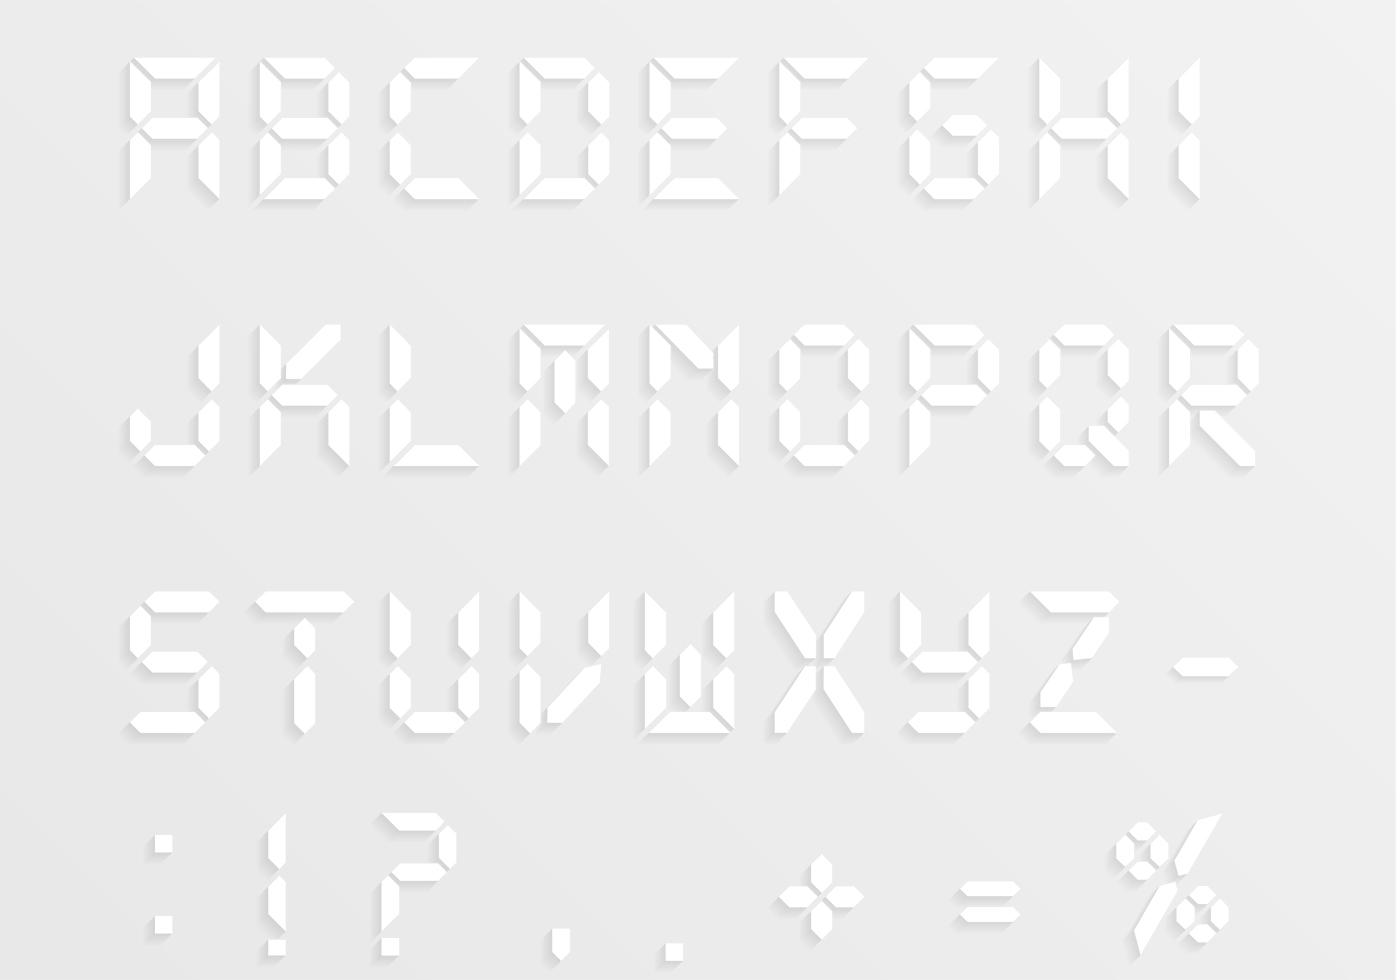 Digital Alphabet And Numbers Psd